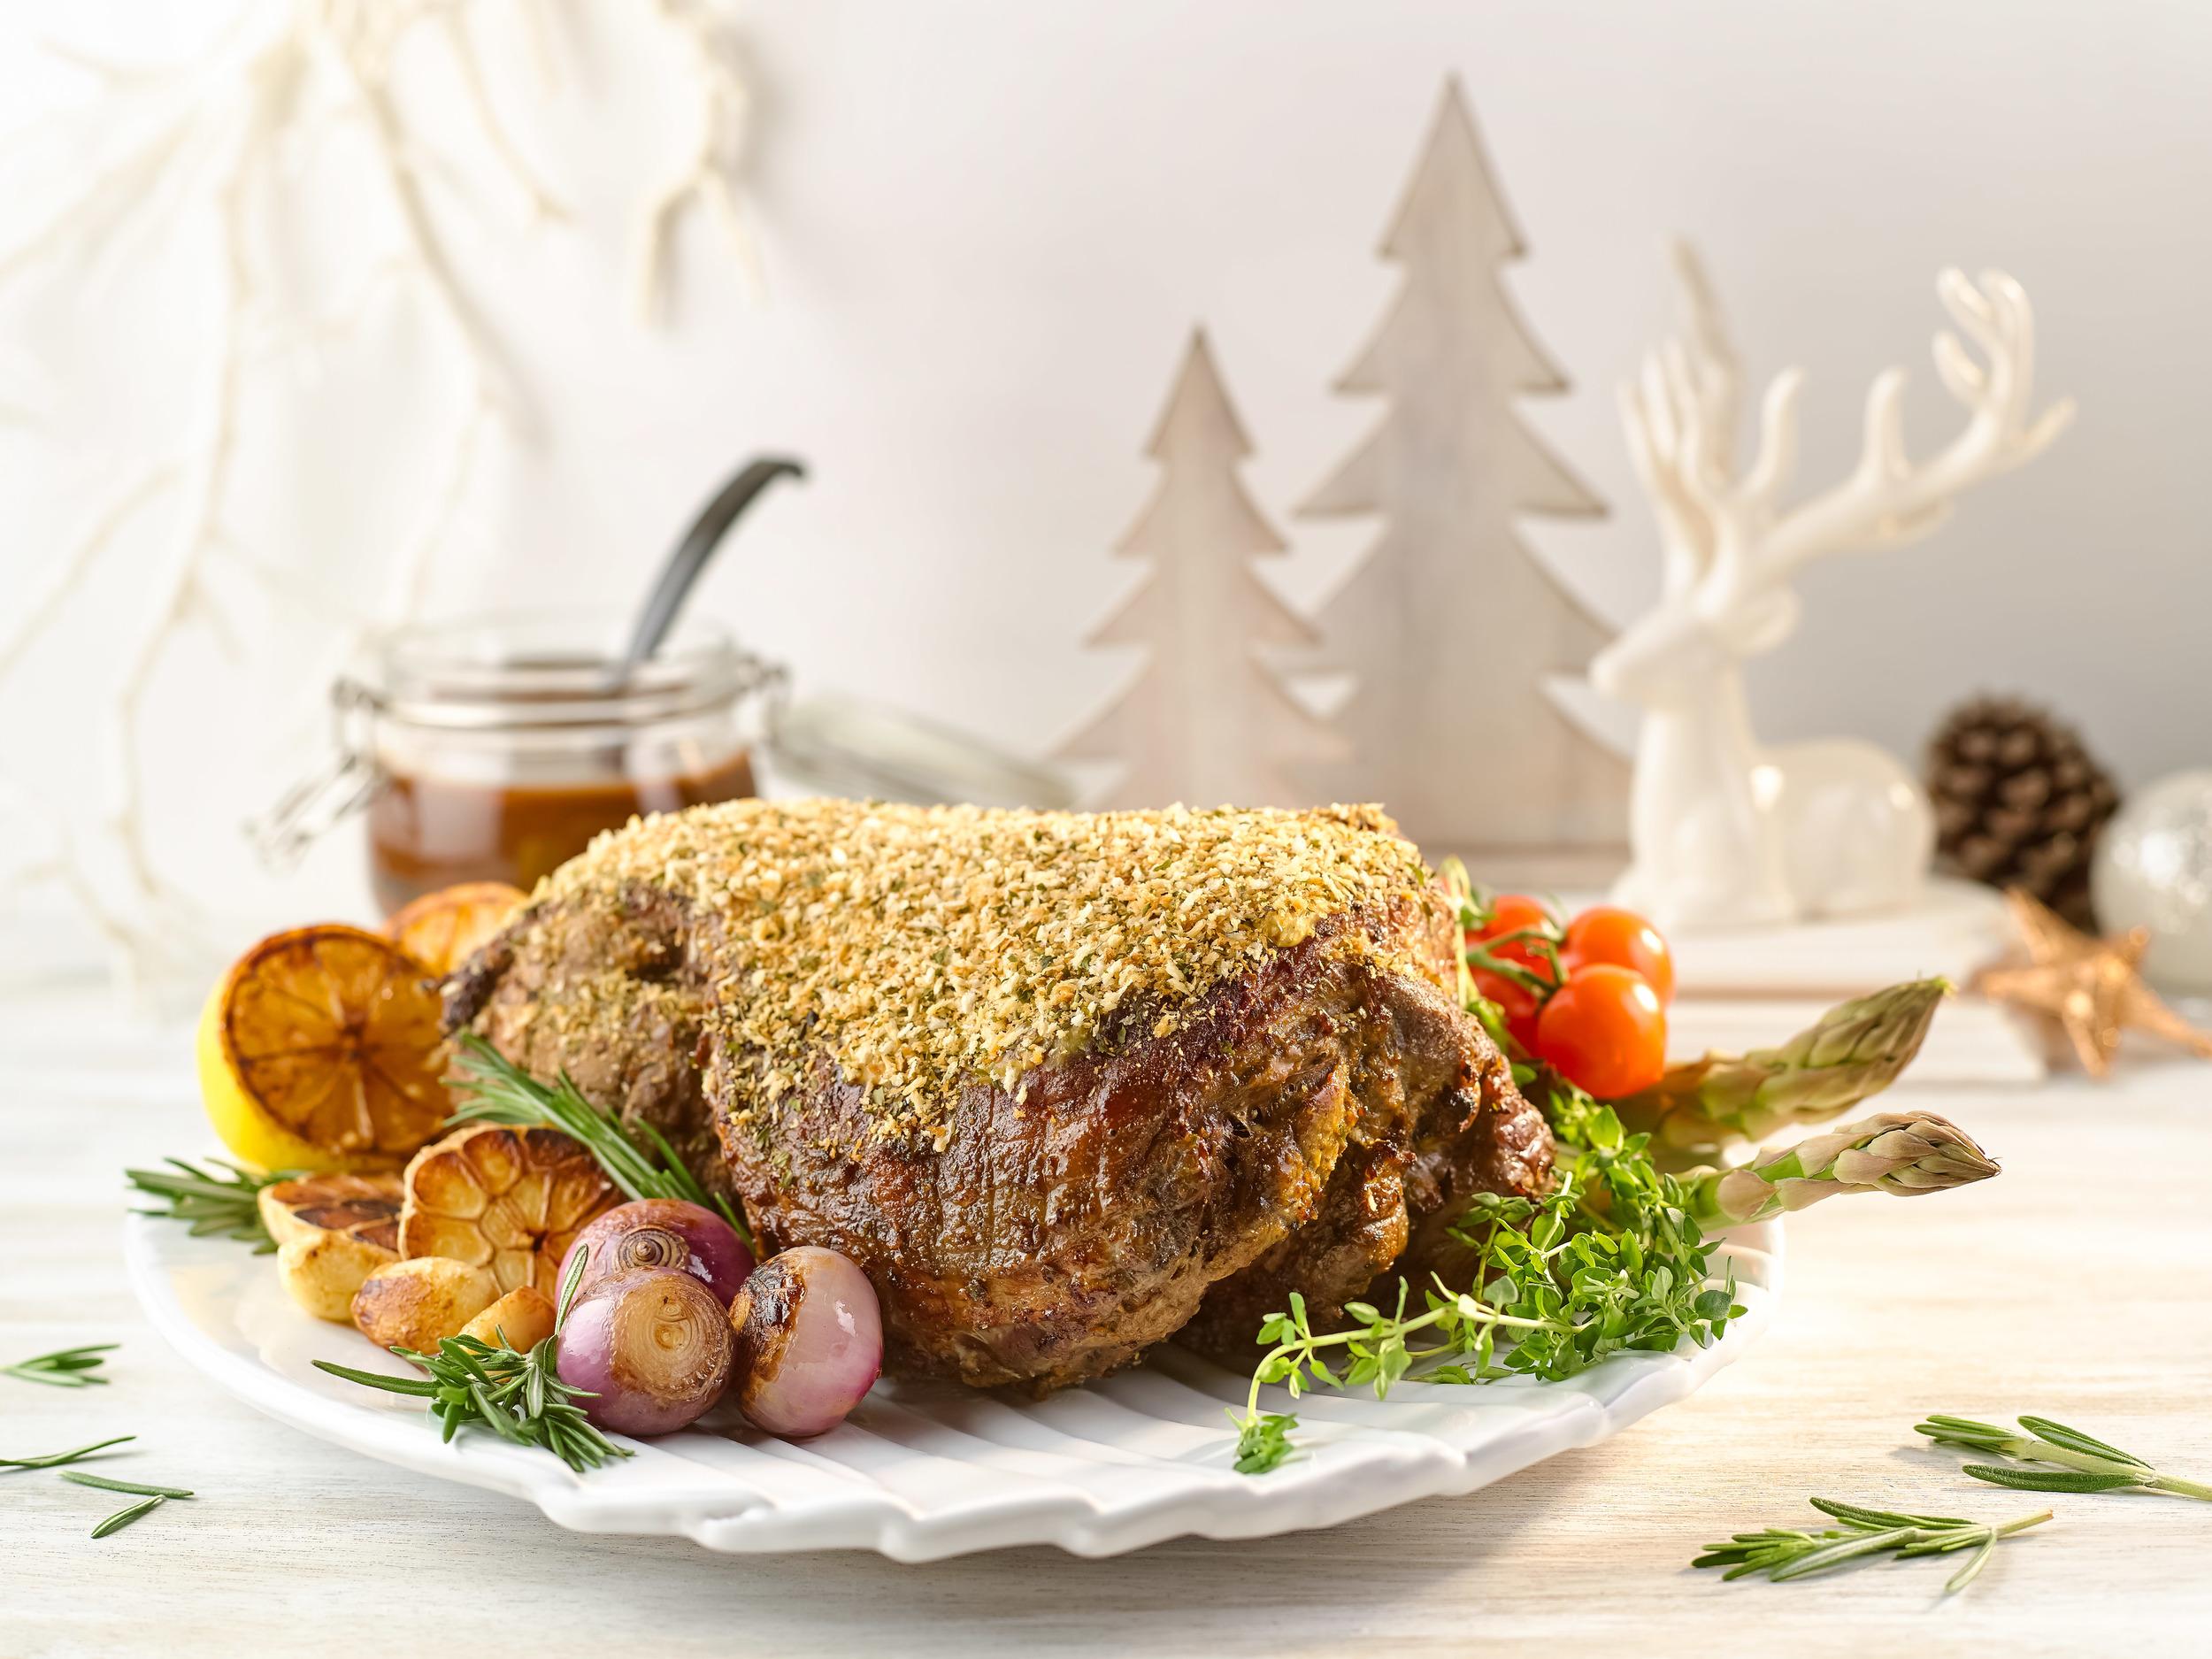 Roasted Leg of Lamb with Rosemary Garlic and Caramelised Shallot Sauce | Photo Credit: Crowne Plaza Changi Airport